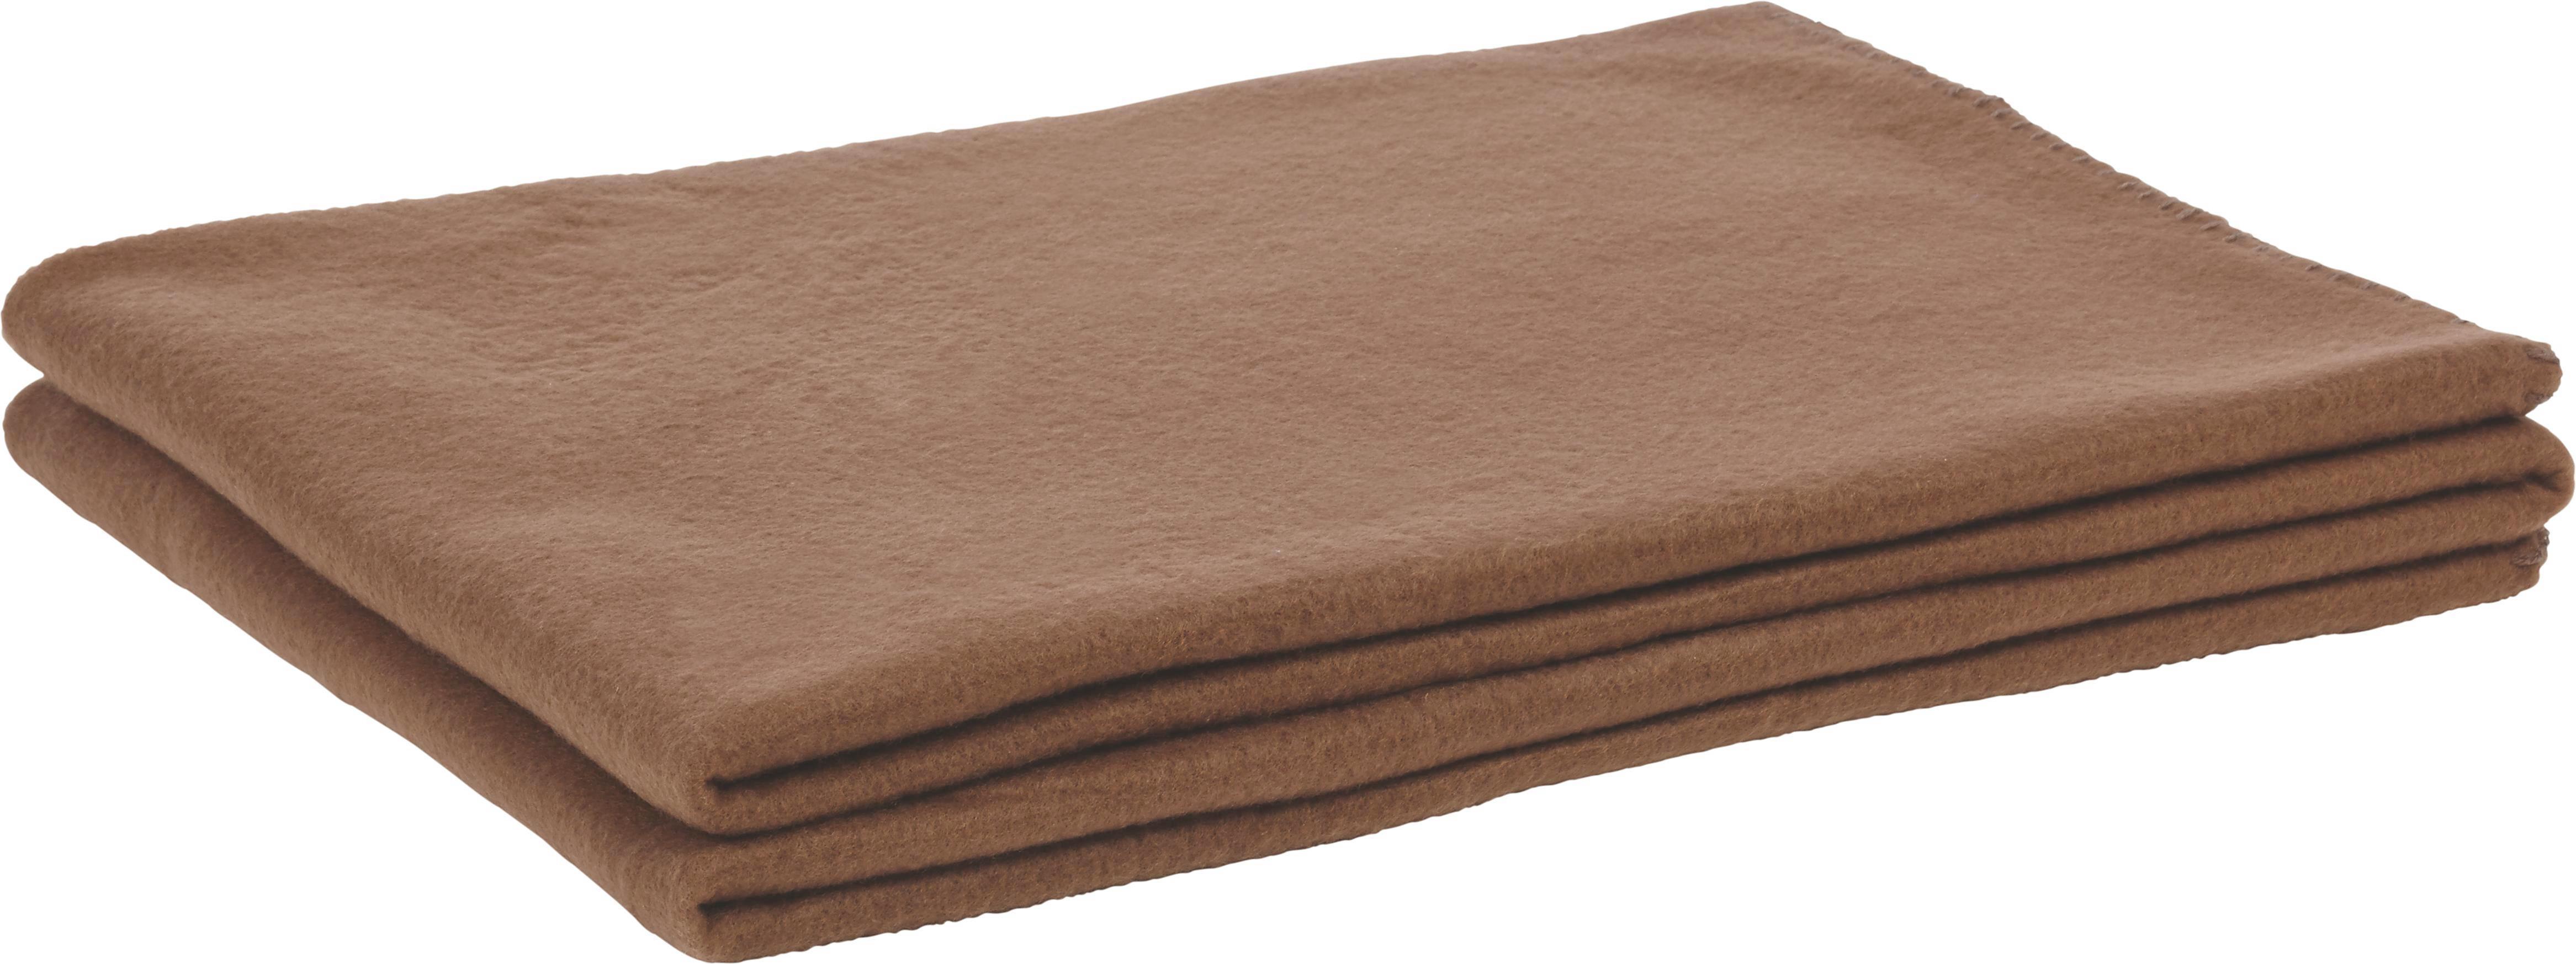 Fleecedecke Trendix in Braun - Braun, Textil (130/180cm) - MÖMAX modern living